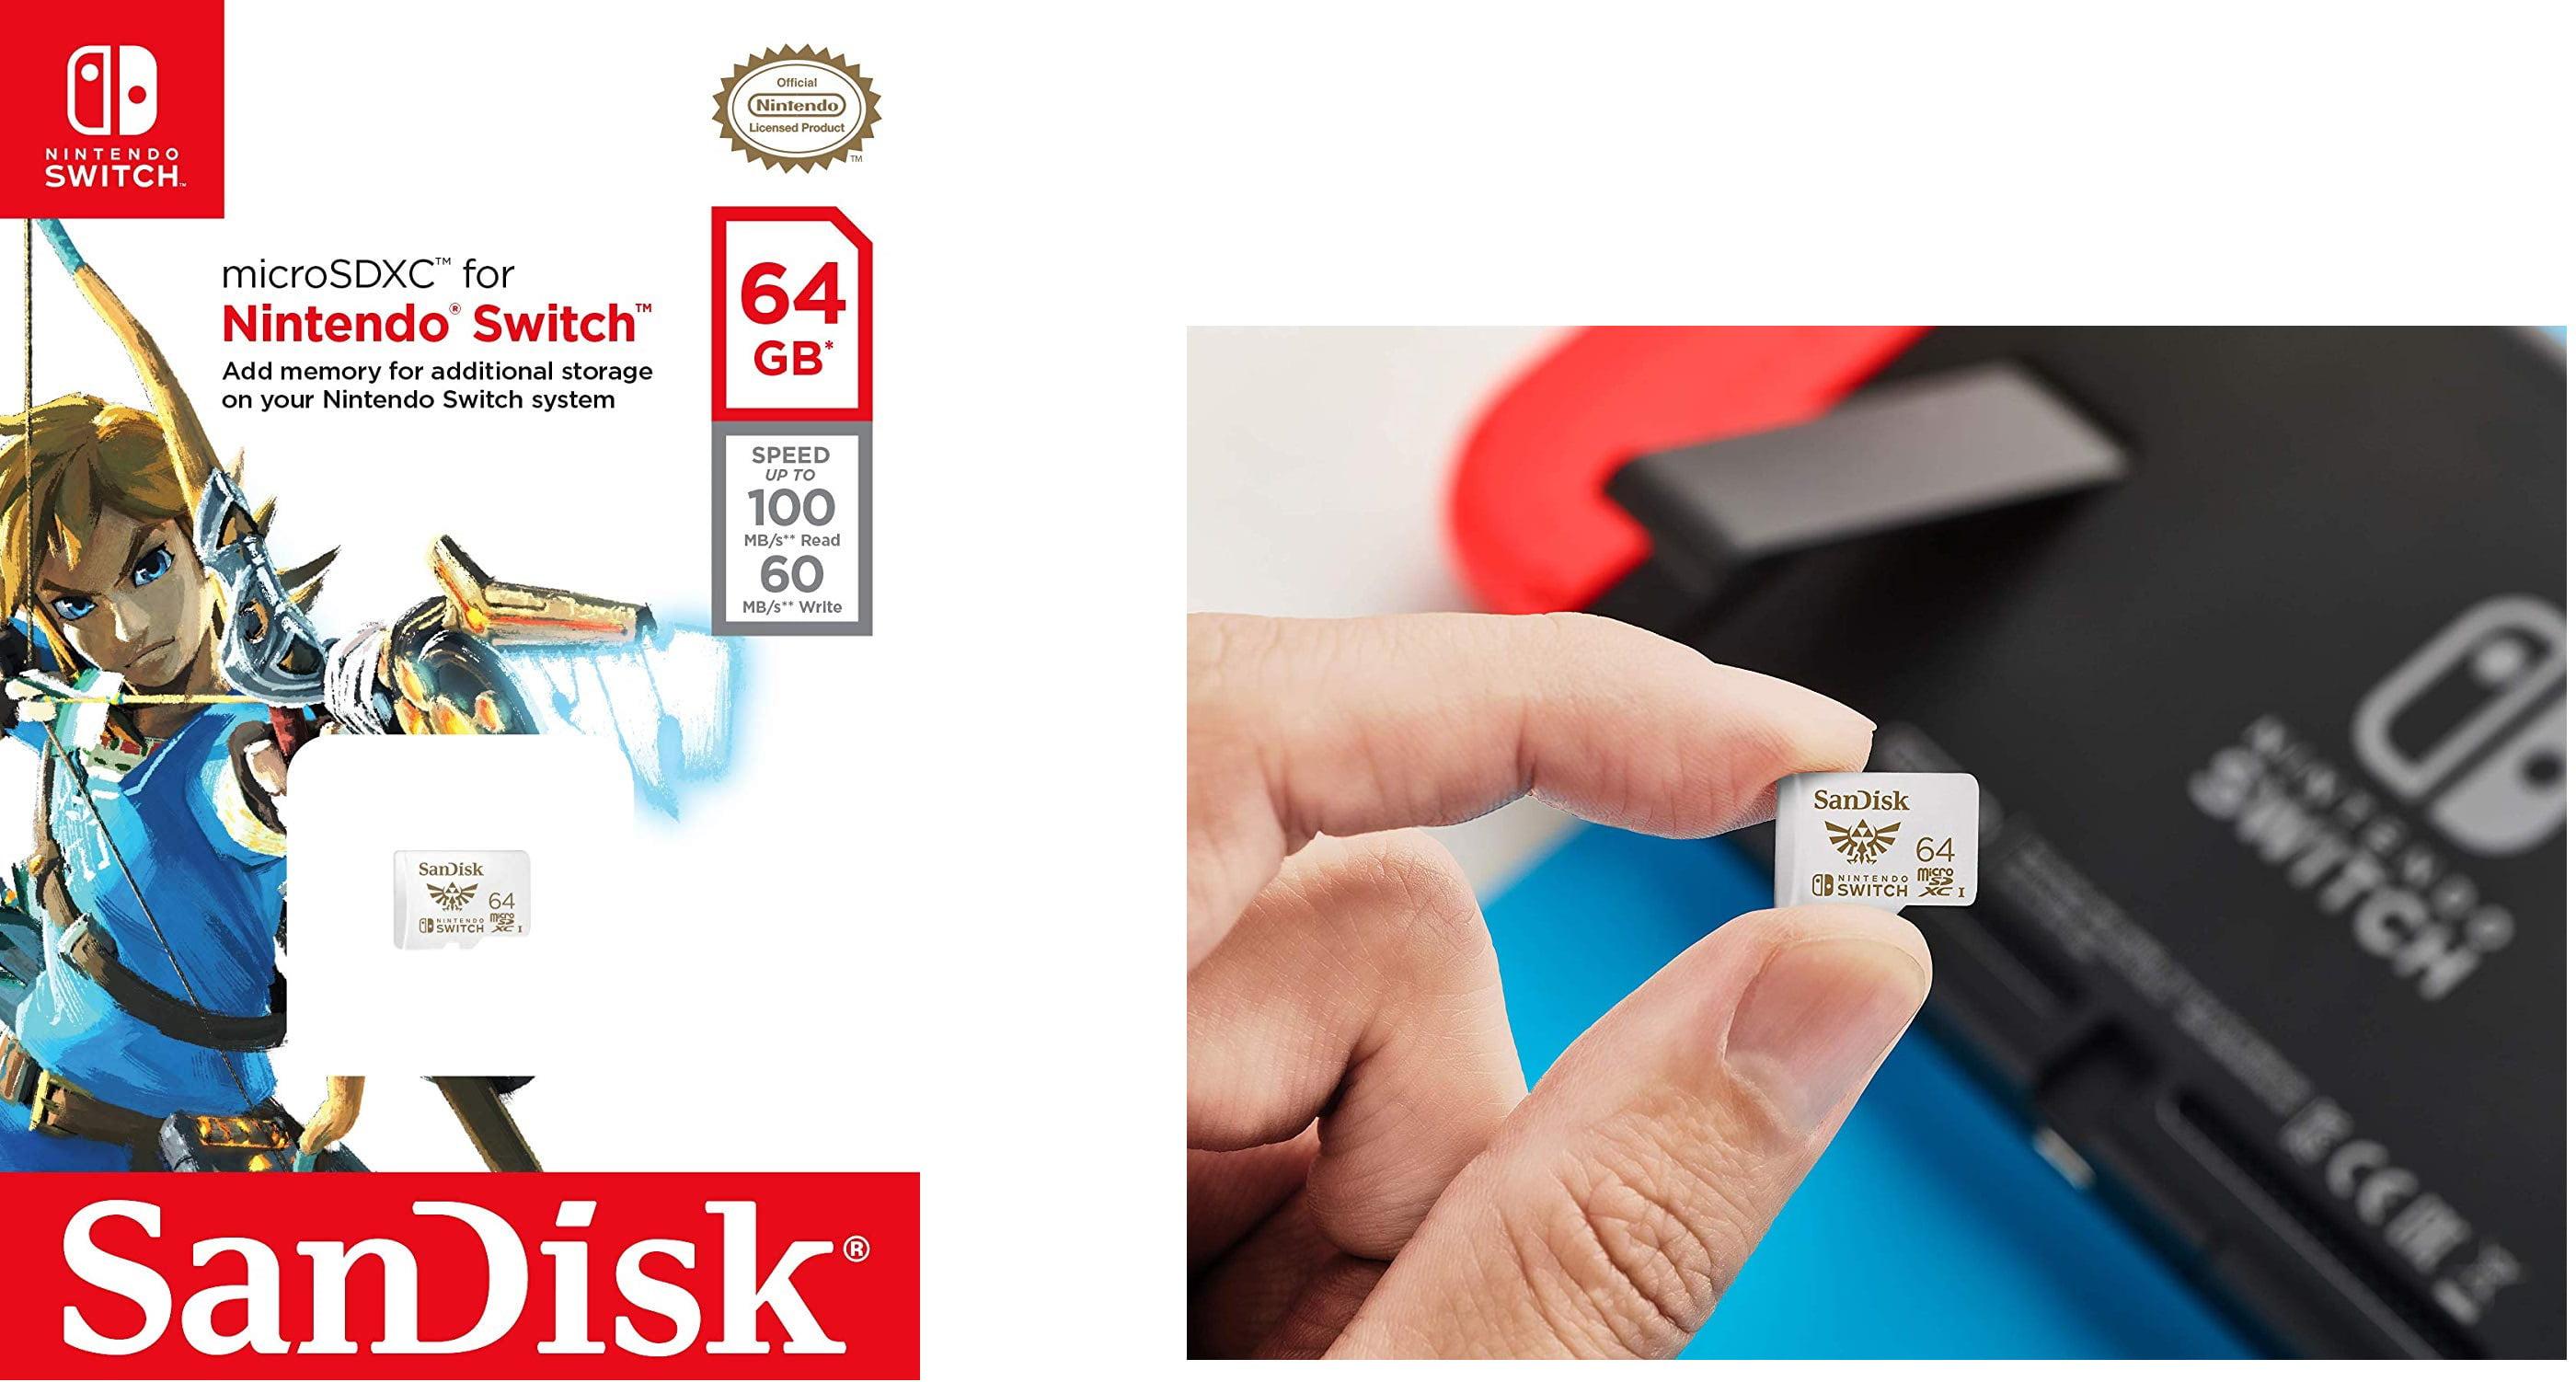 SanDisk 64 GB microSDXC